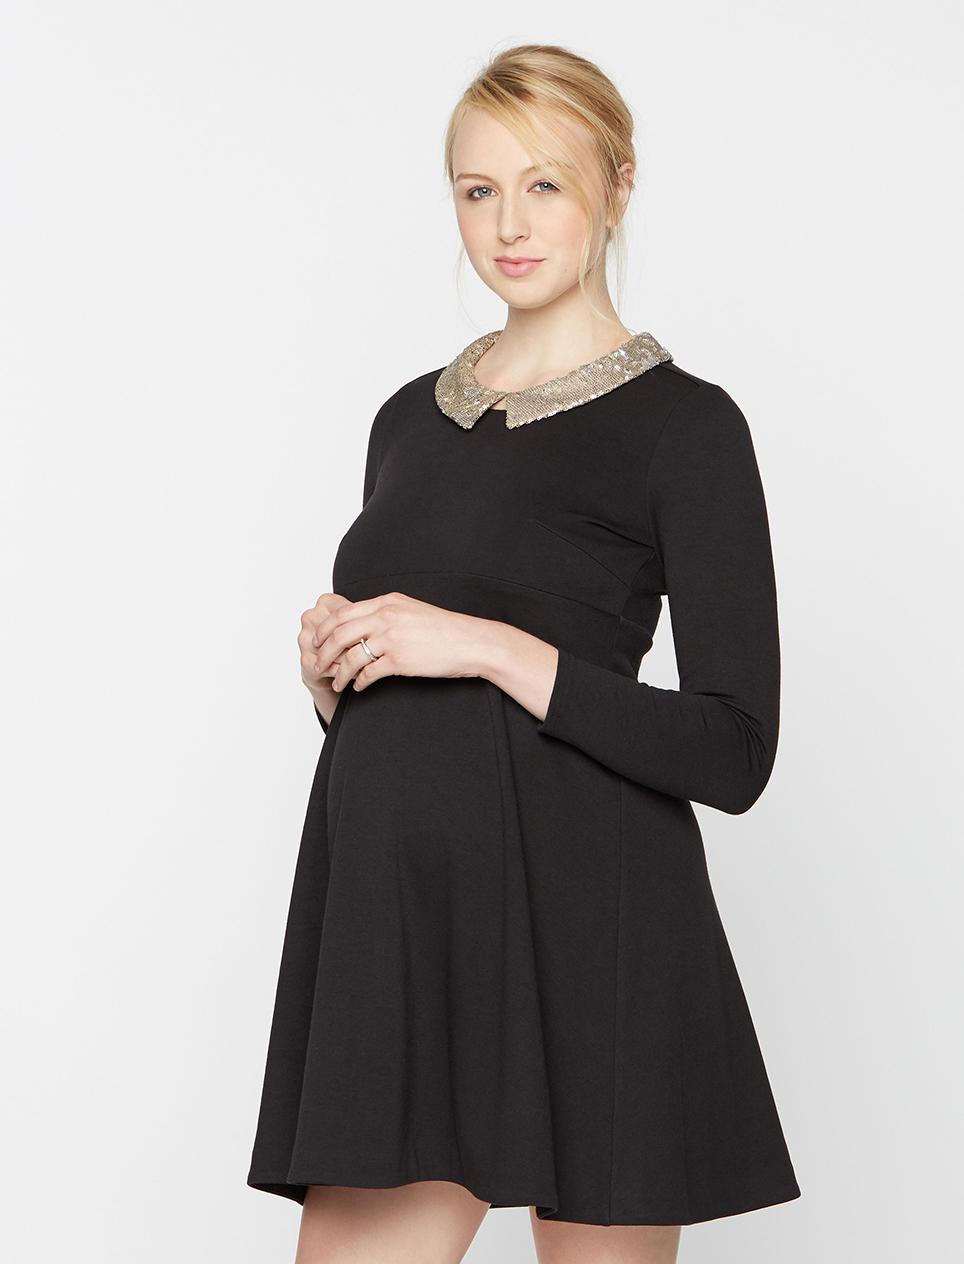 Rachel Zoe Beaded Collar Maternity Mini Dress | Destination ...